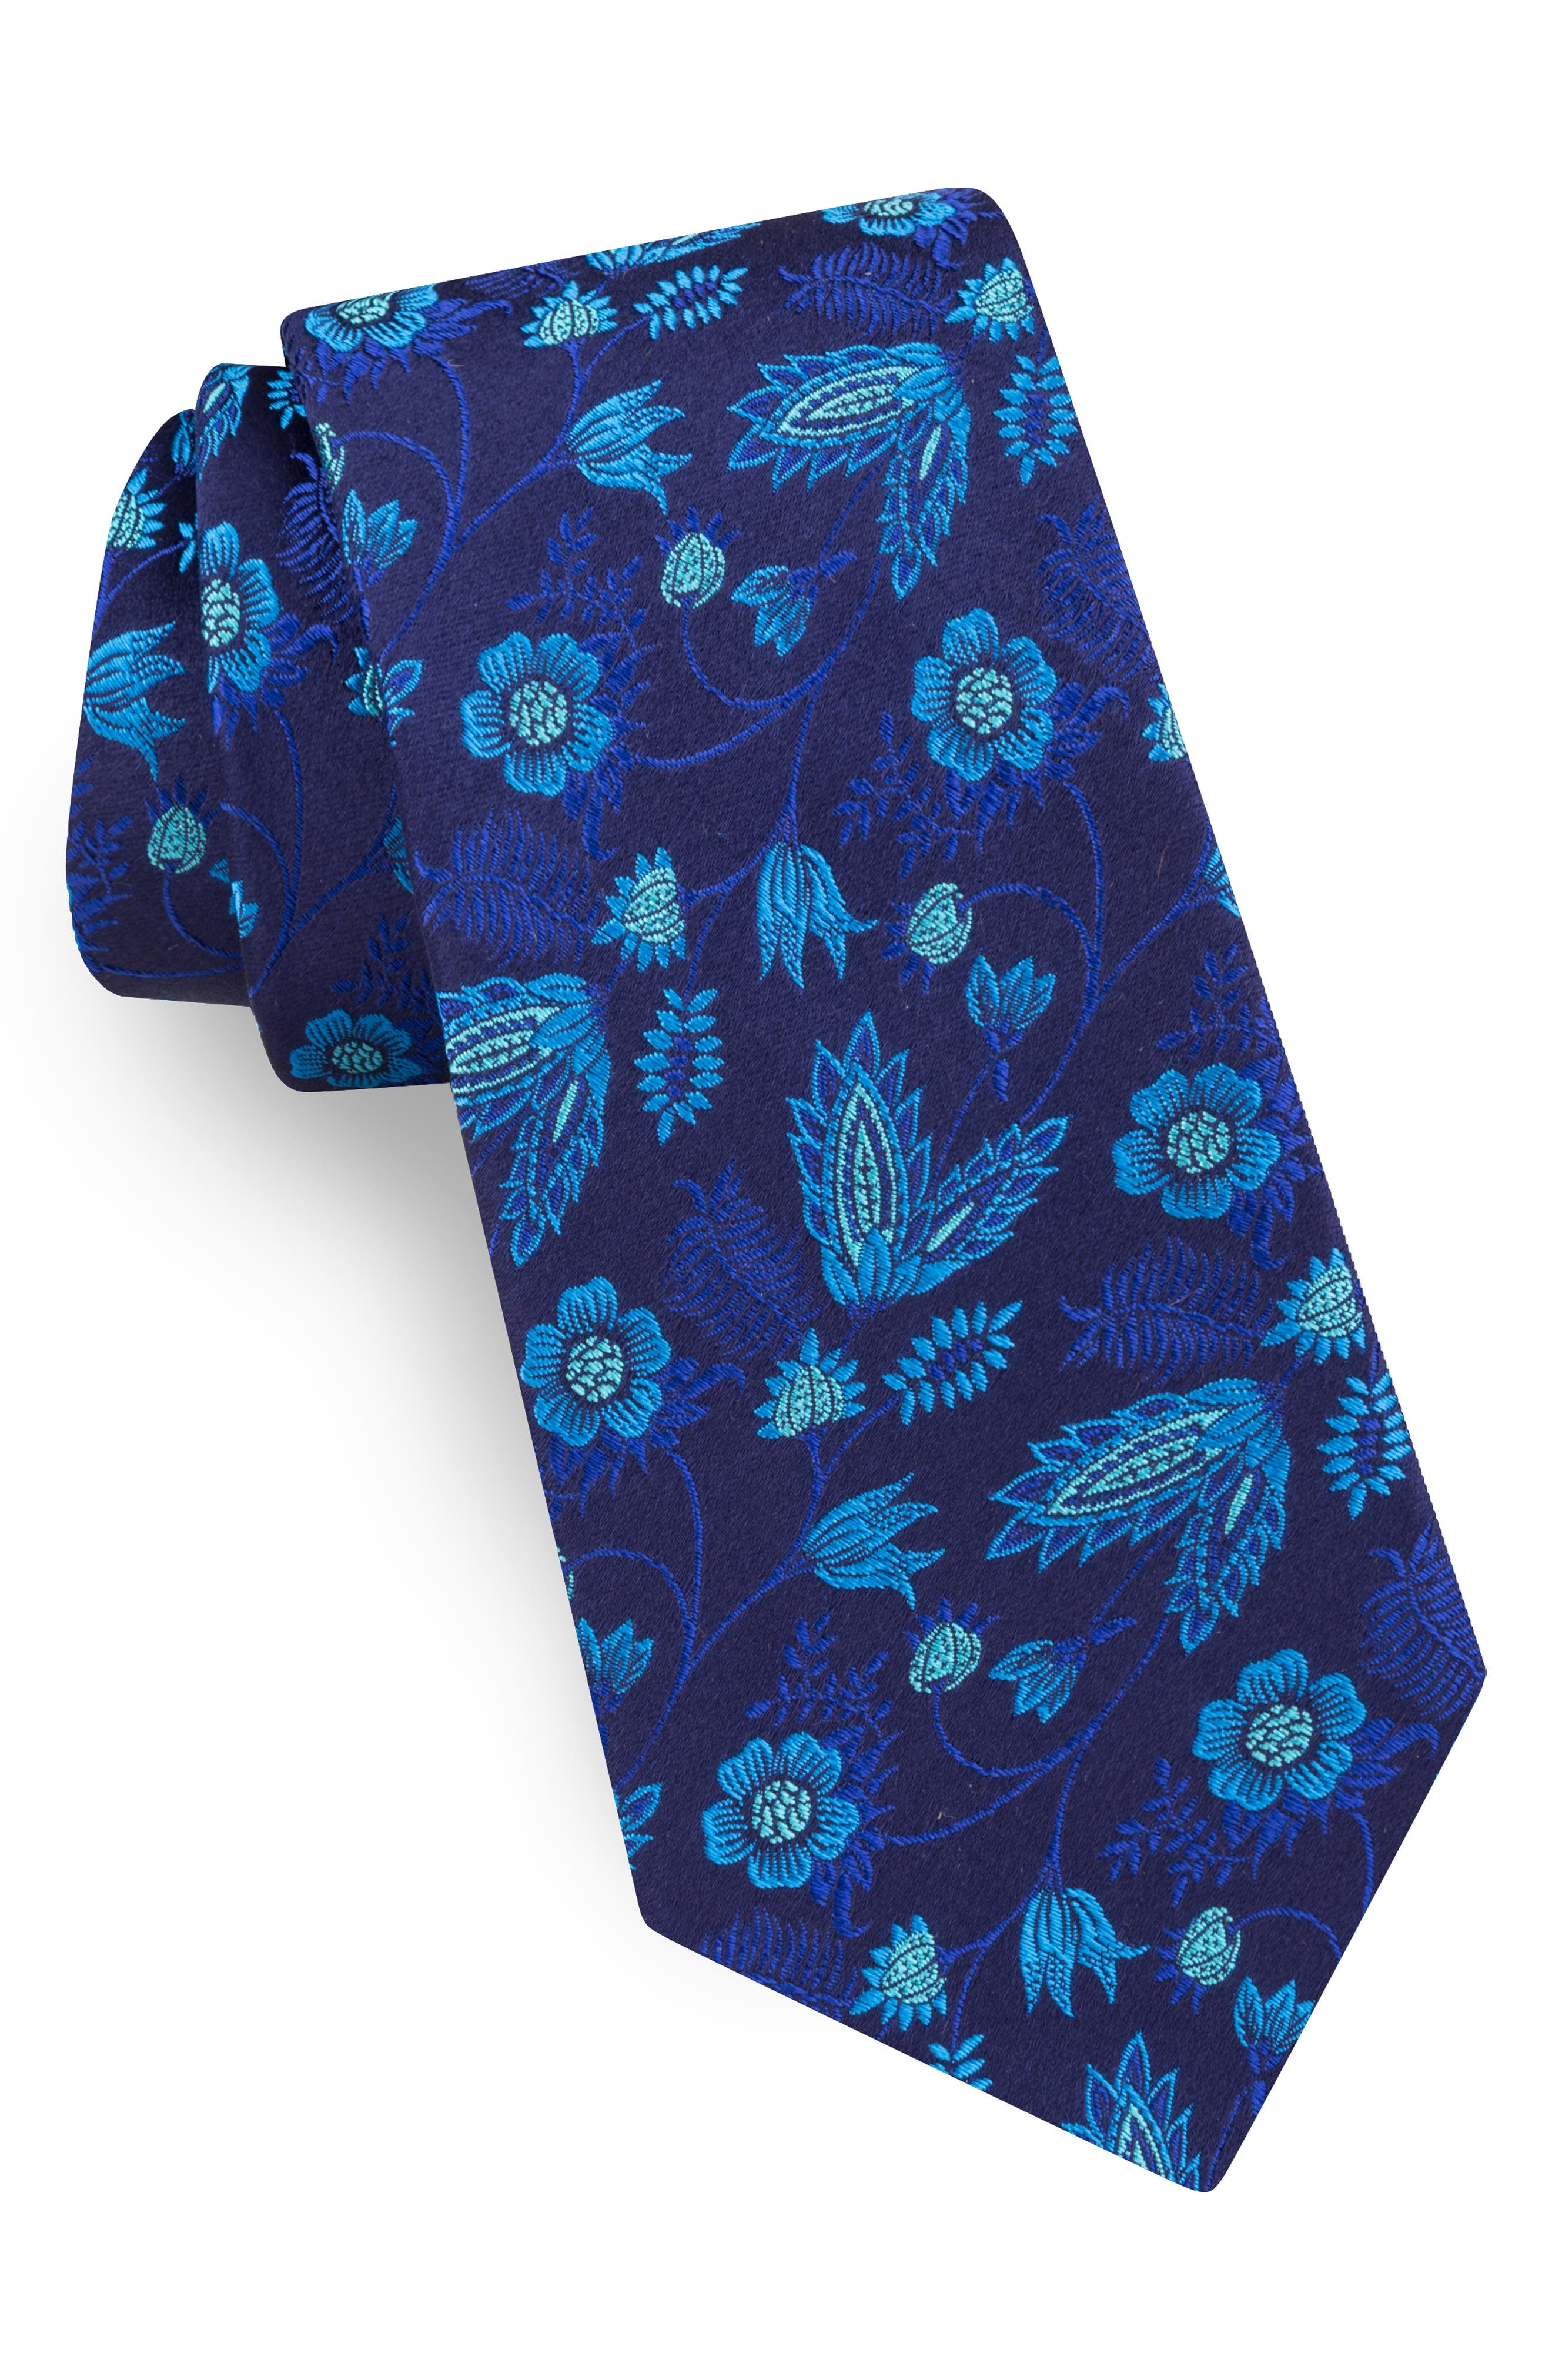 Floral Silk Tie,                             Main thumbnail 1, color,                             AQUA/ TEAL